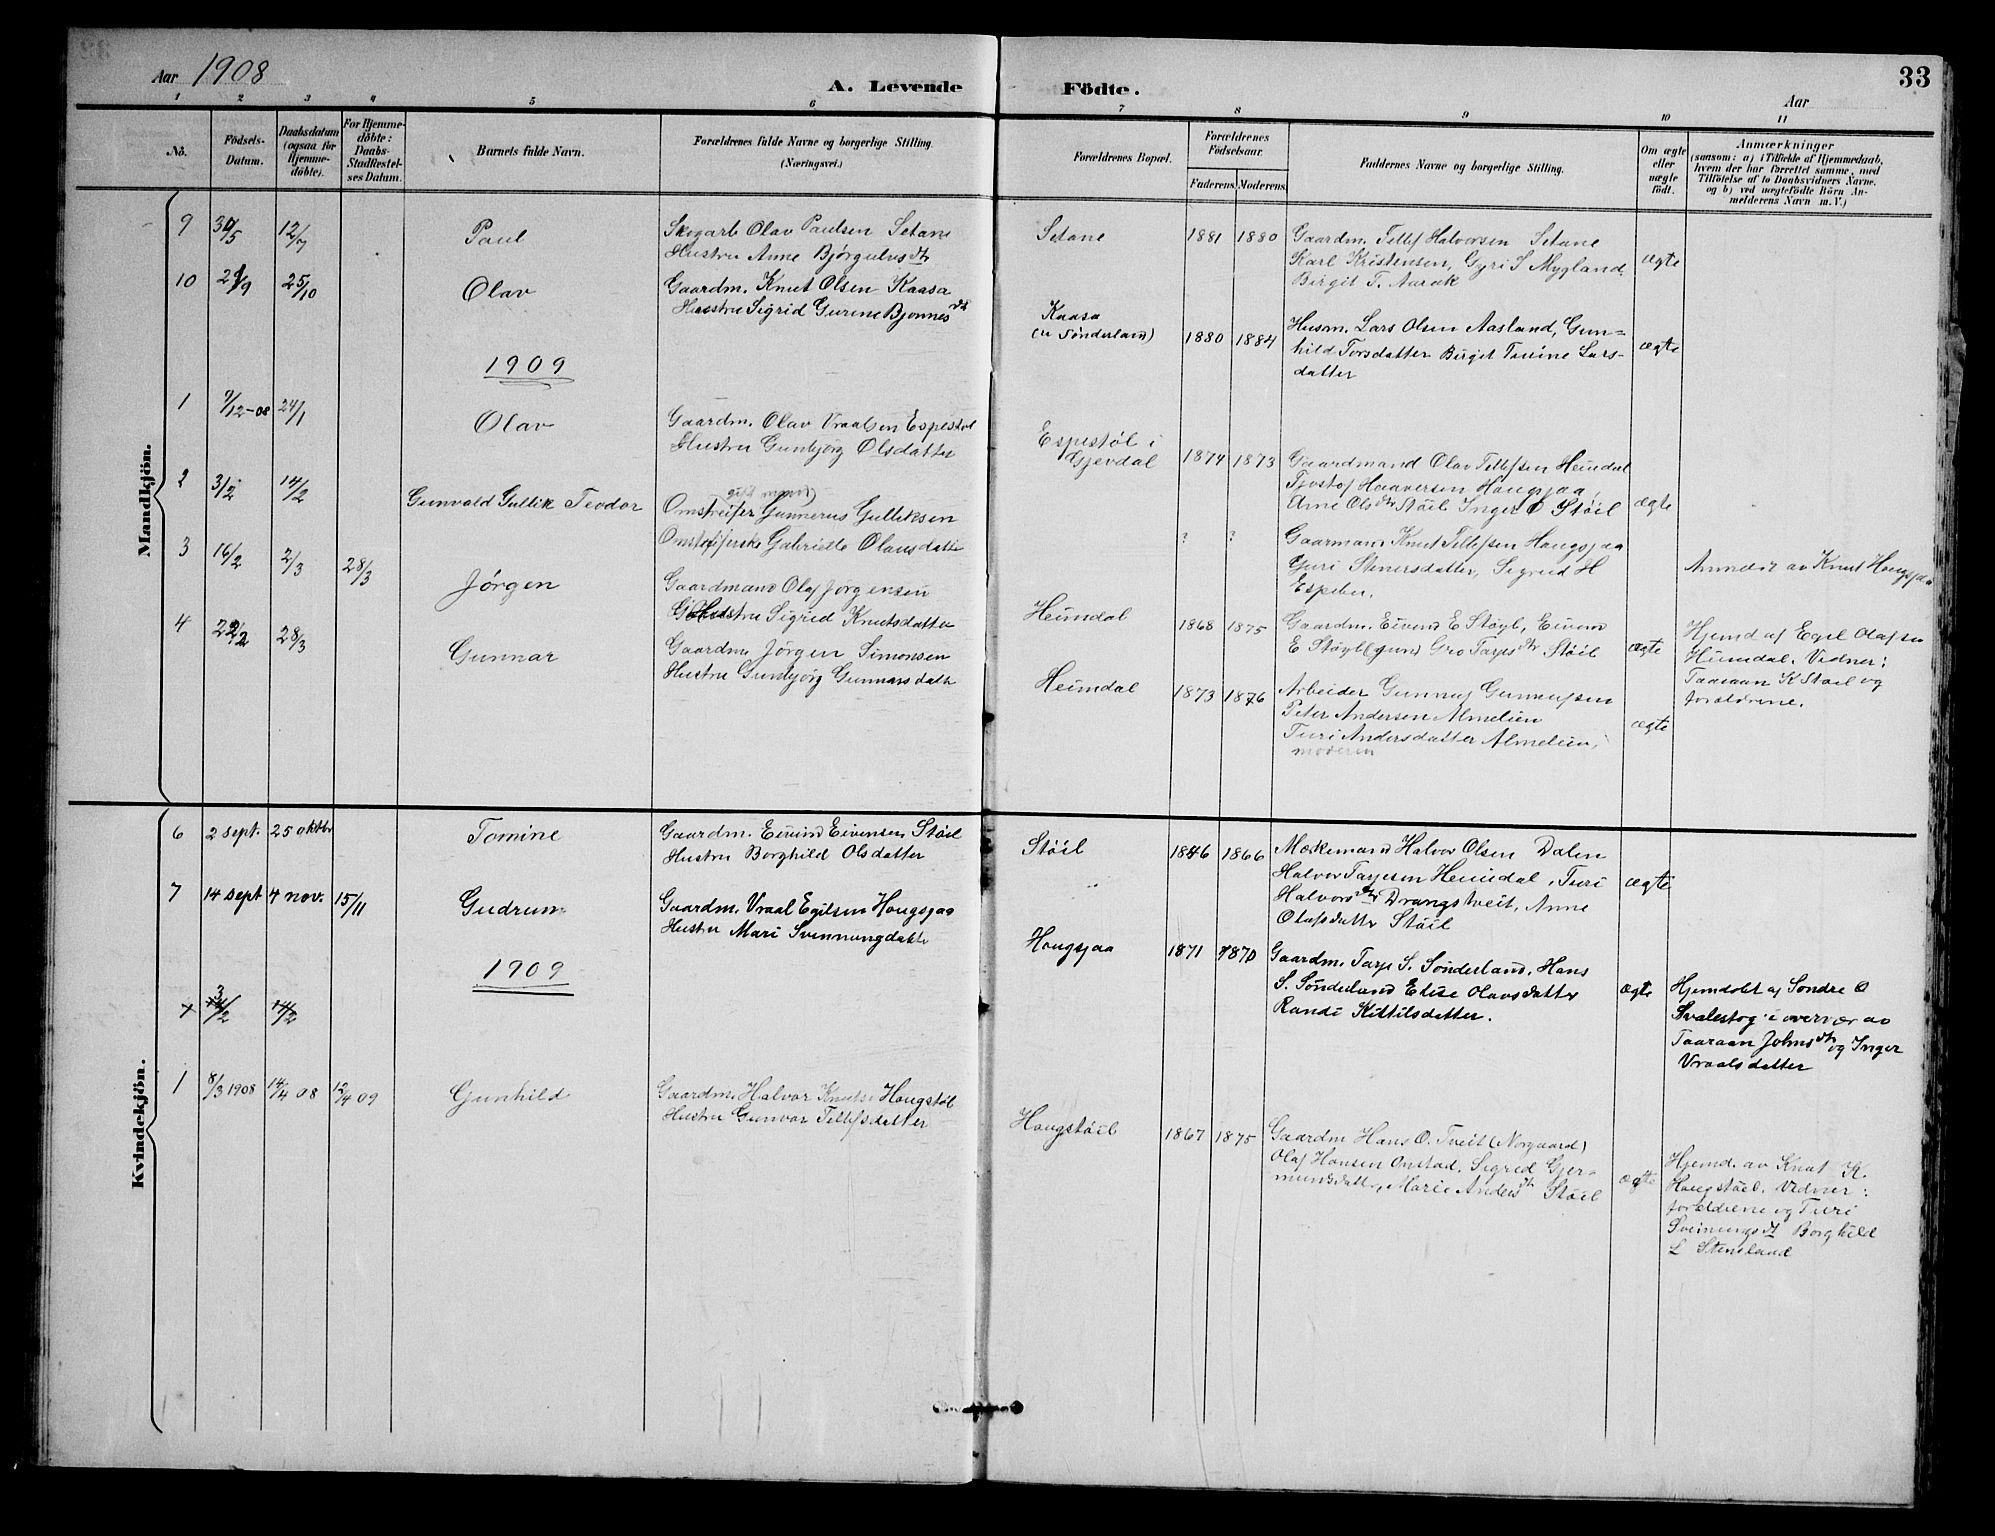 SAKO, Nissedal kirkebøker, G/Gb/L0003: Klokkerbok nr. II 3, 1893-1928, s. 33